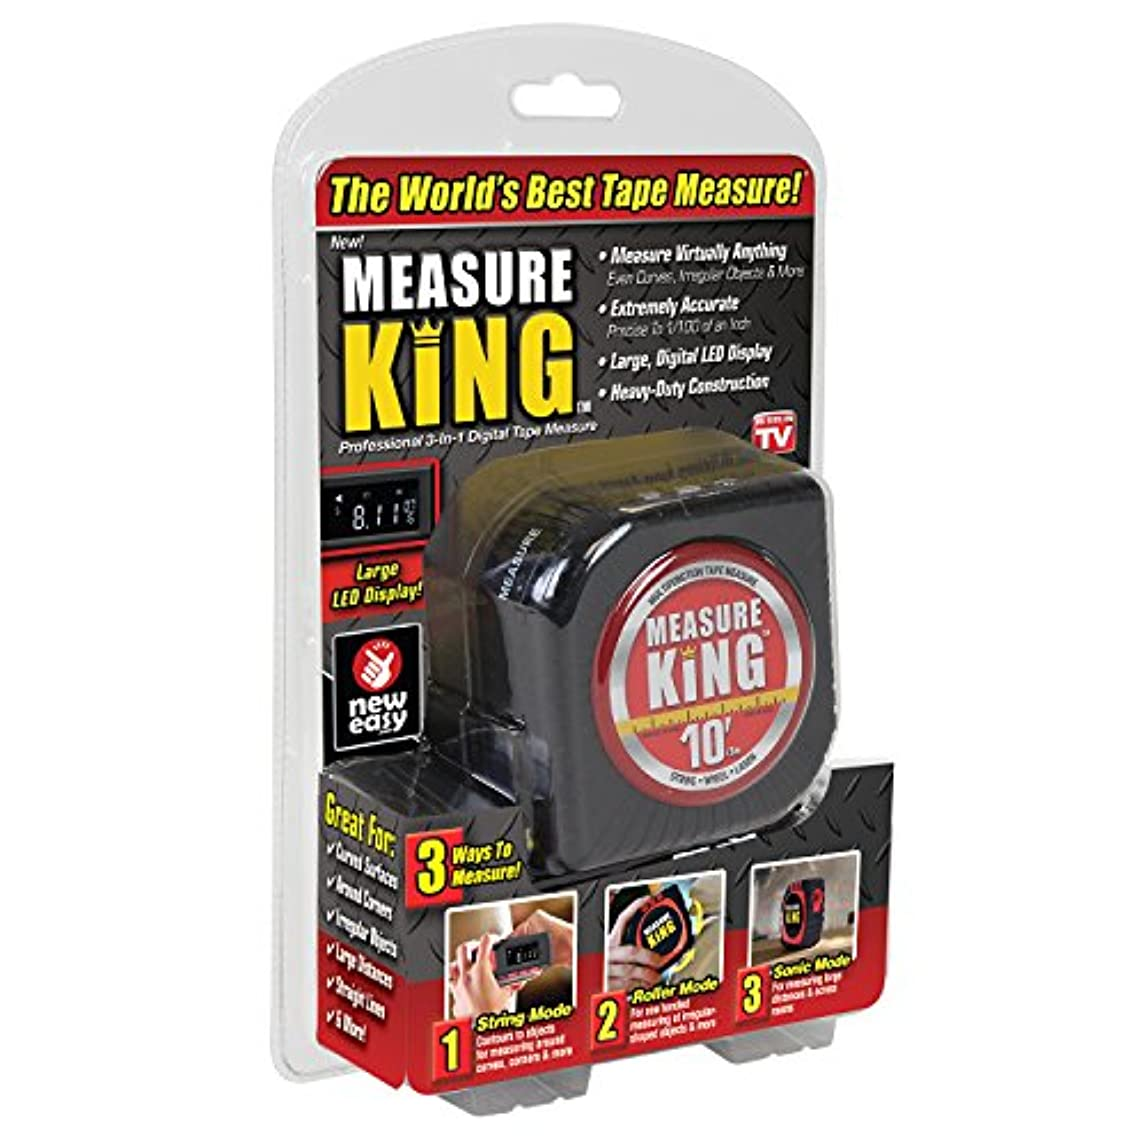 ONTEL MK-MC12/4 Measure King 3-in-1 Digital Tape Measure String Mode, Sonic Mode & Roller Mode As seen On Tv